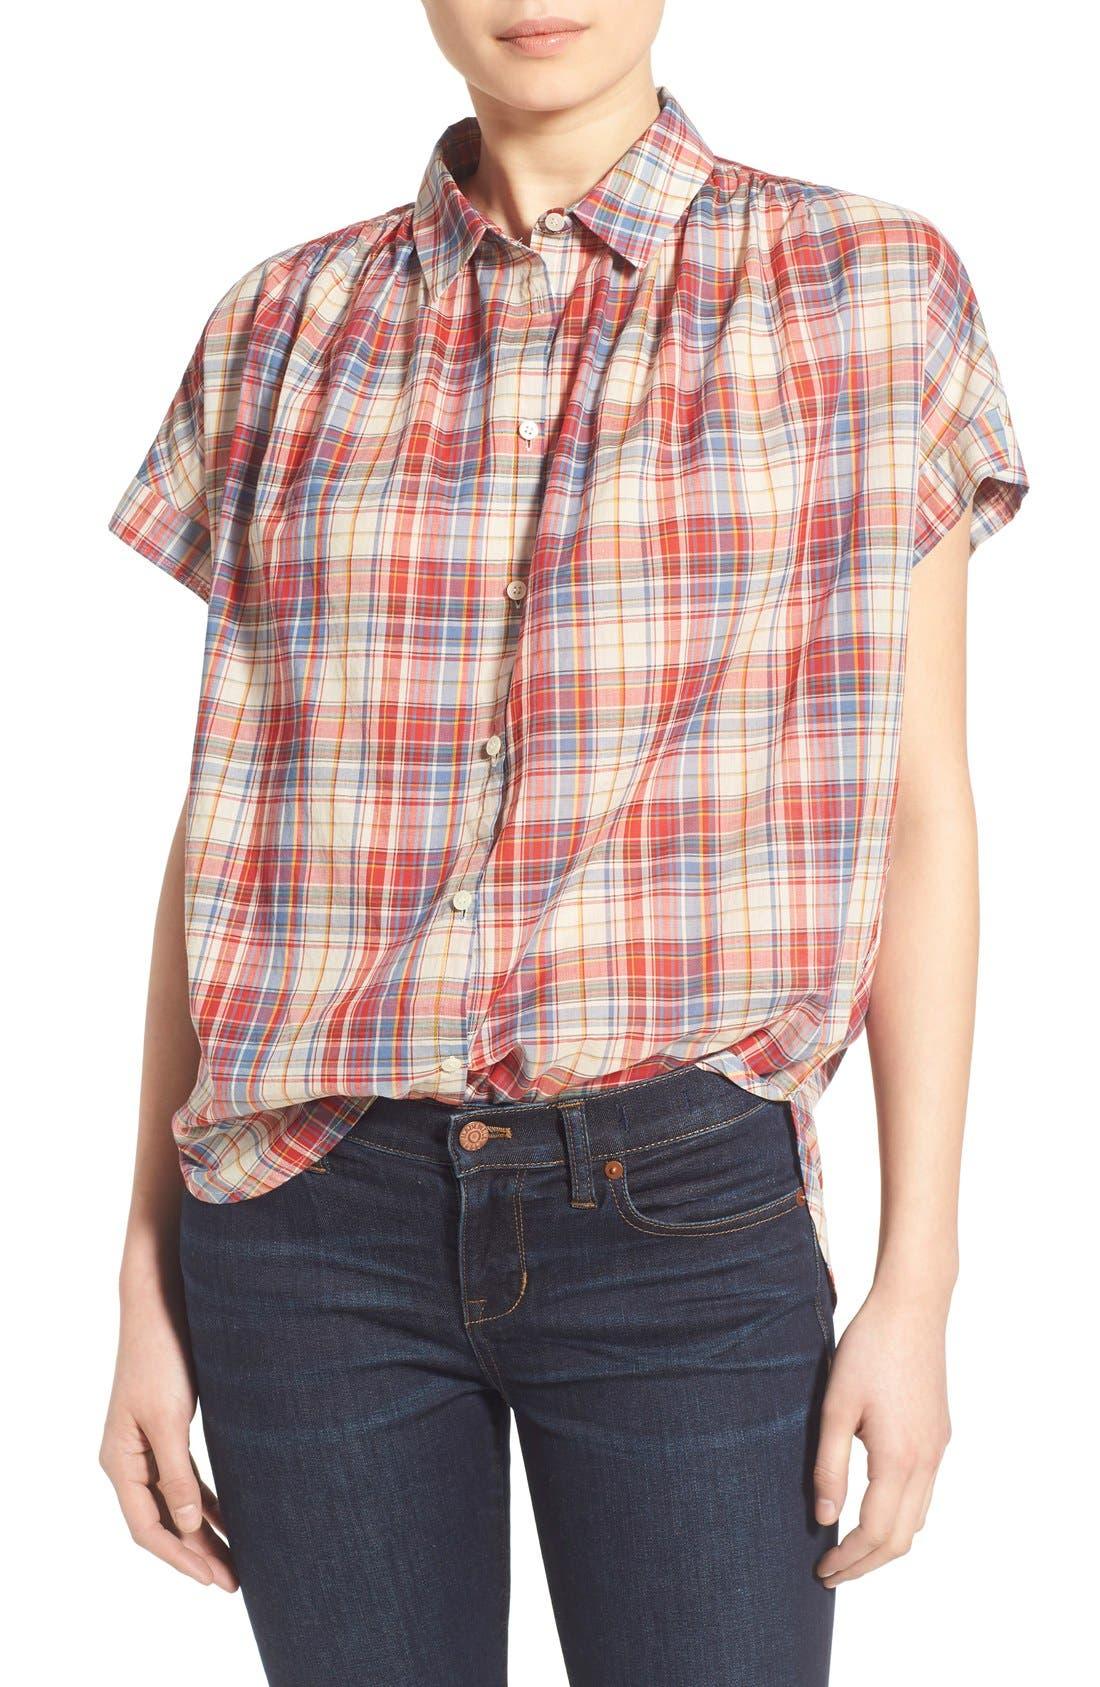 Alternate Image 1 Selected - Madewell Plaid Boxy Cotton Shirt